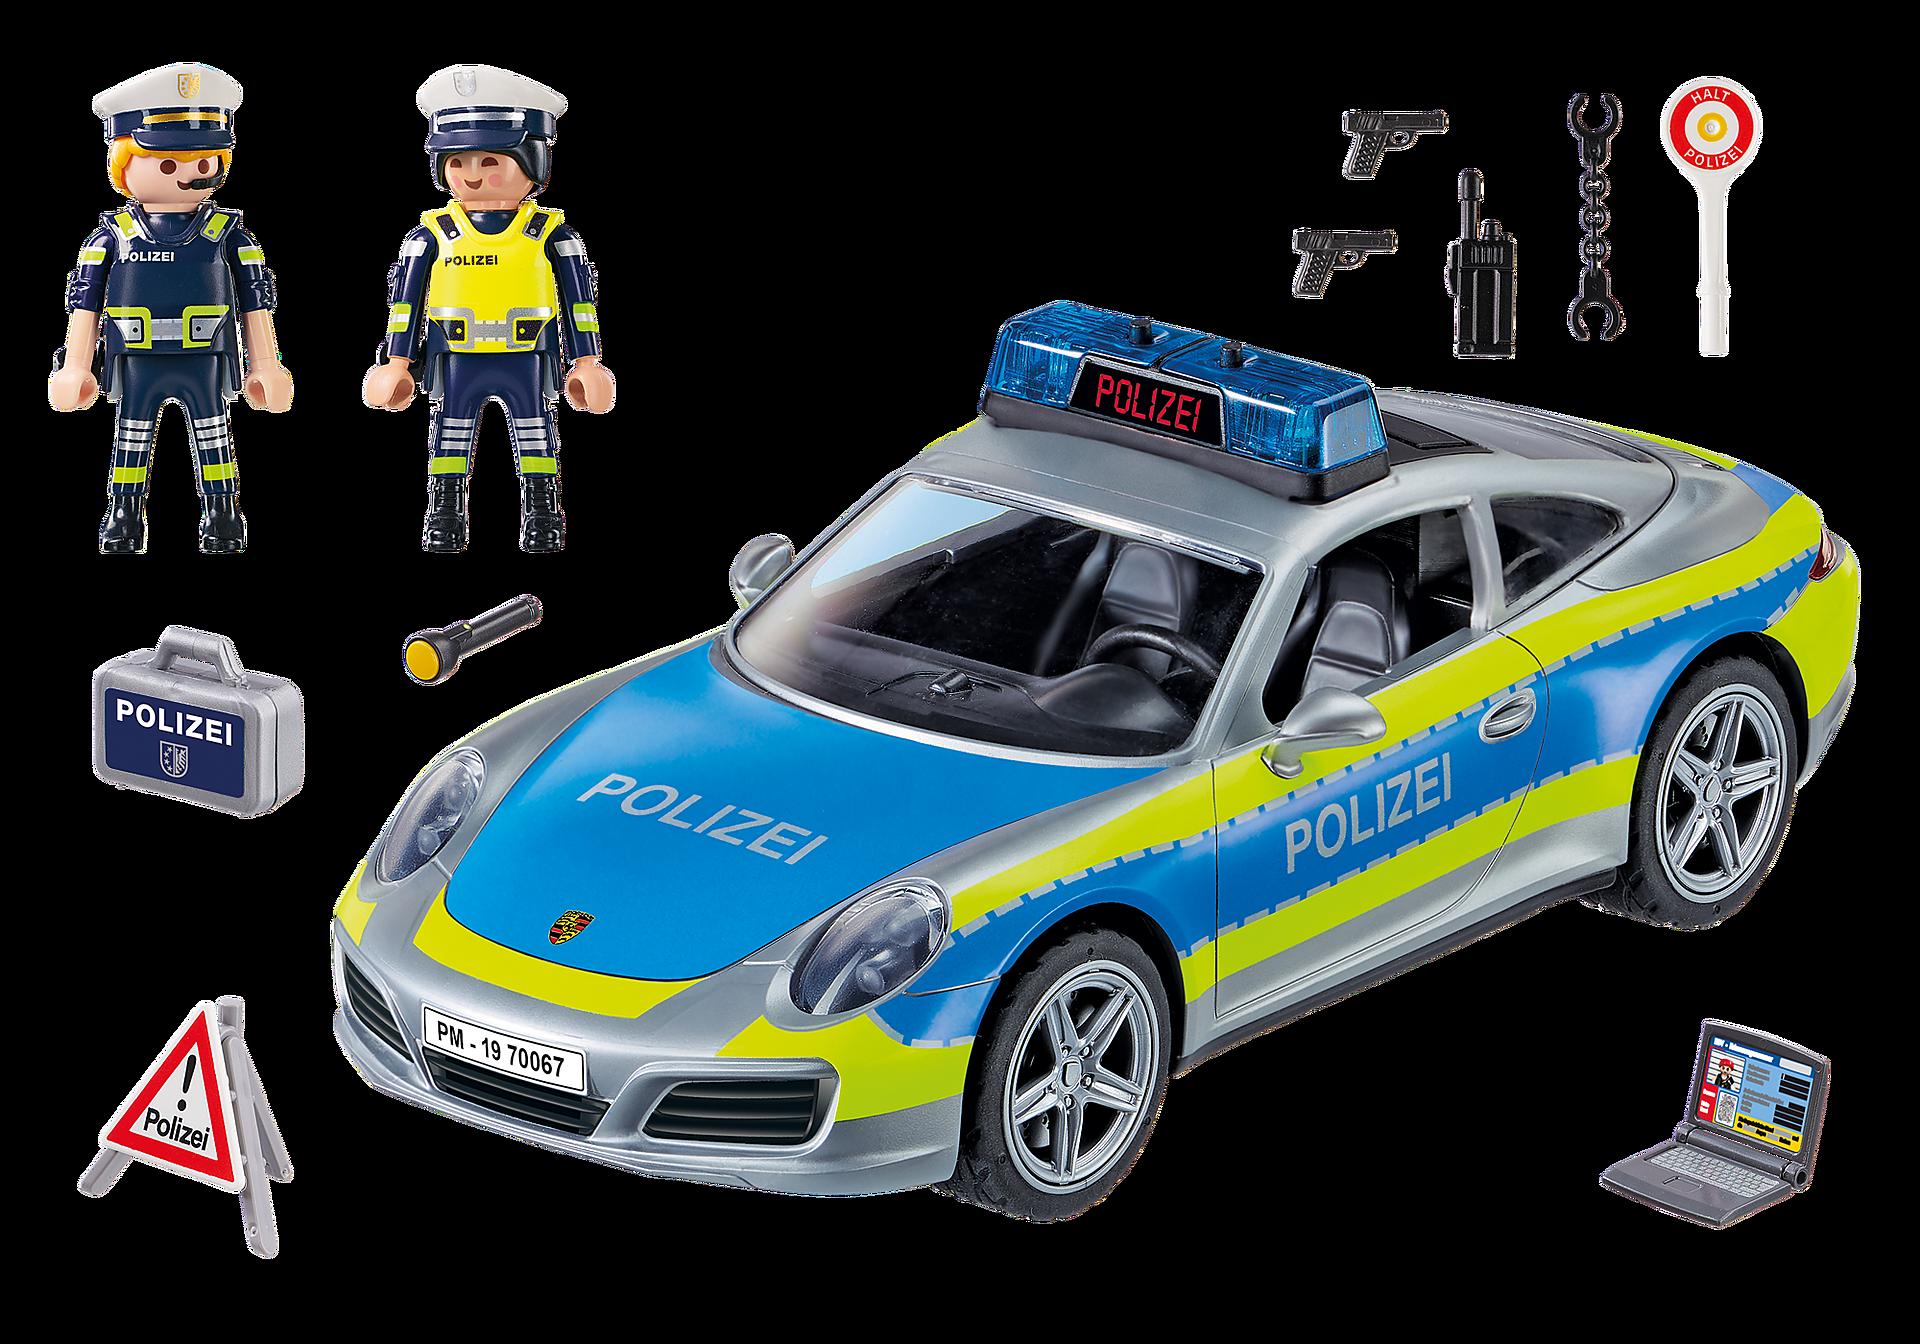 70067 Porsche 911 Carrera 4S Police zoom image3